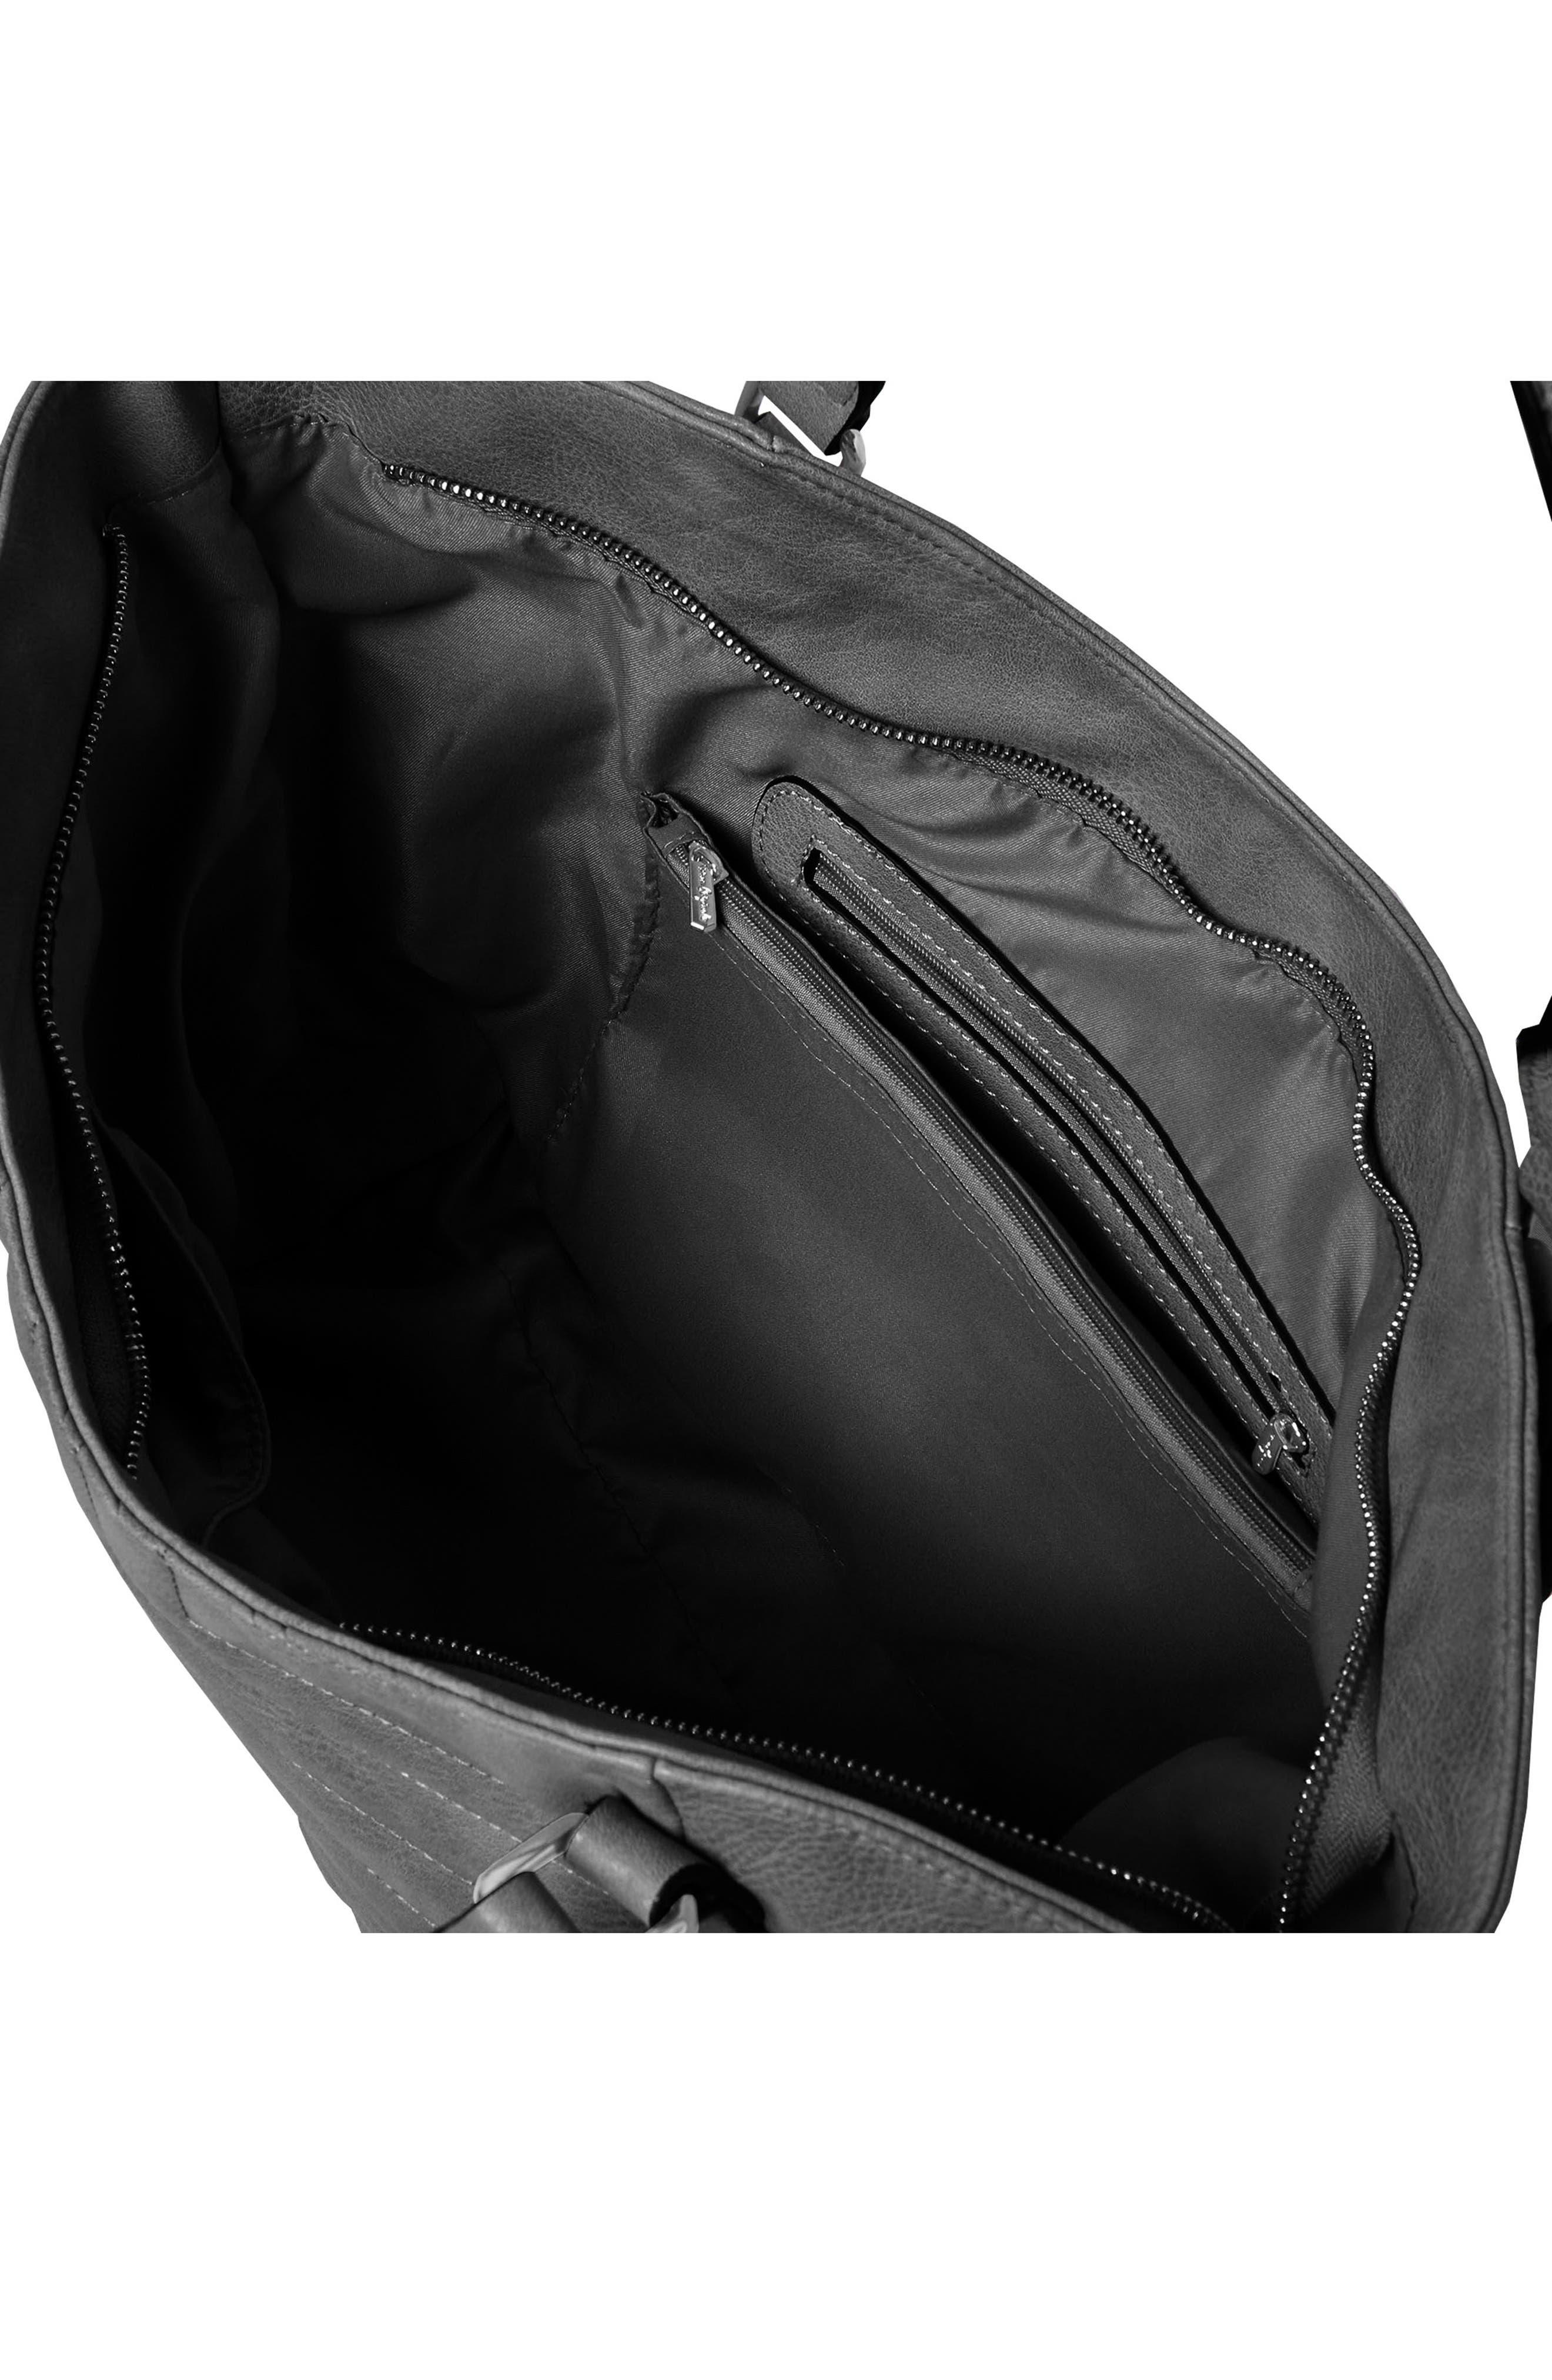 URBAN ORIGINALS, Iconic Vegan Leather Tote, Alternate thumbnail 3, color, BLACK